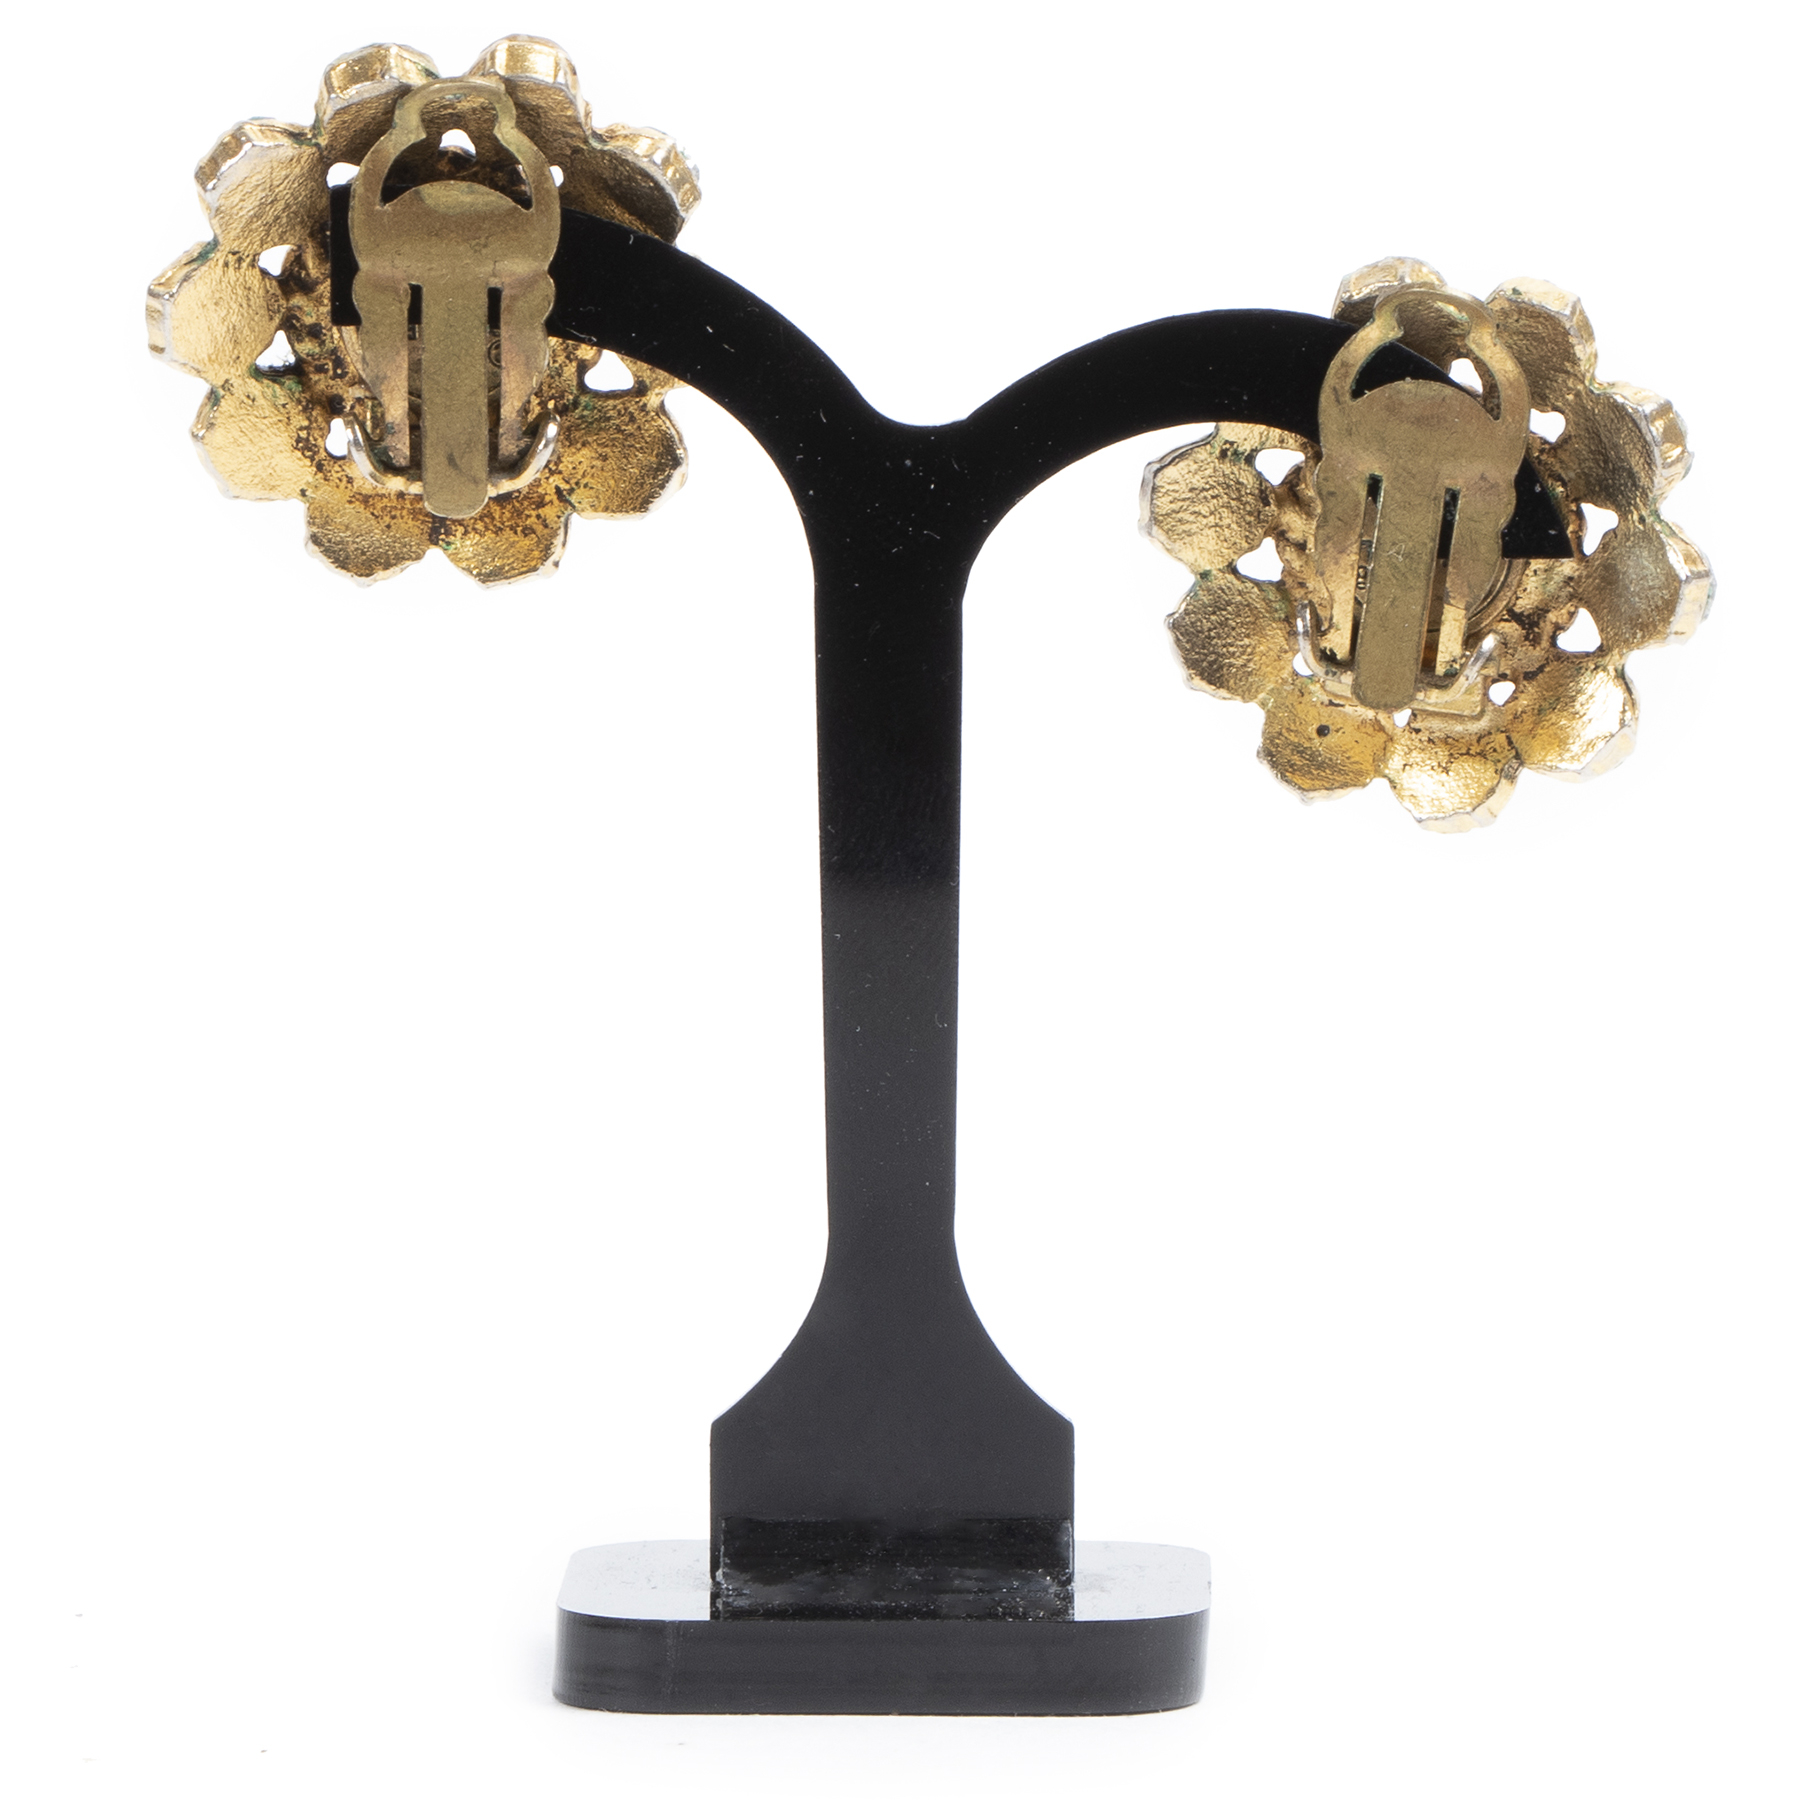 Authentieke Tweedehands Chanel Flower Pearl & Crystal Clip-On Earrings juiste prijs veilig online shoppen luxe merken webshop winkelen Antwerpen België mode fashion